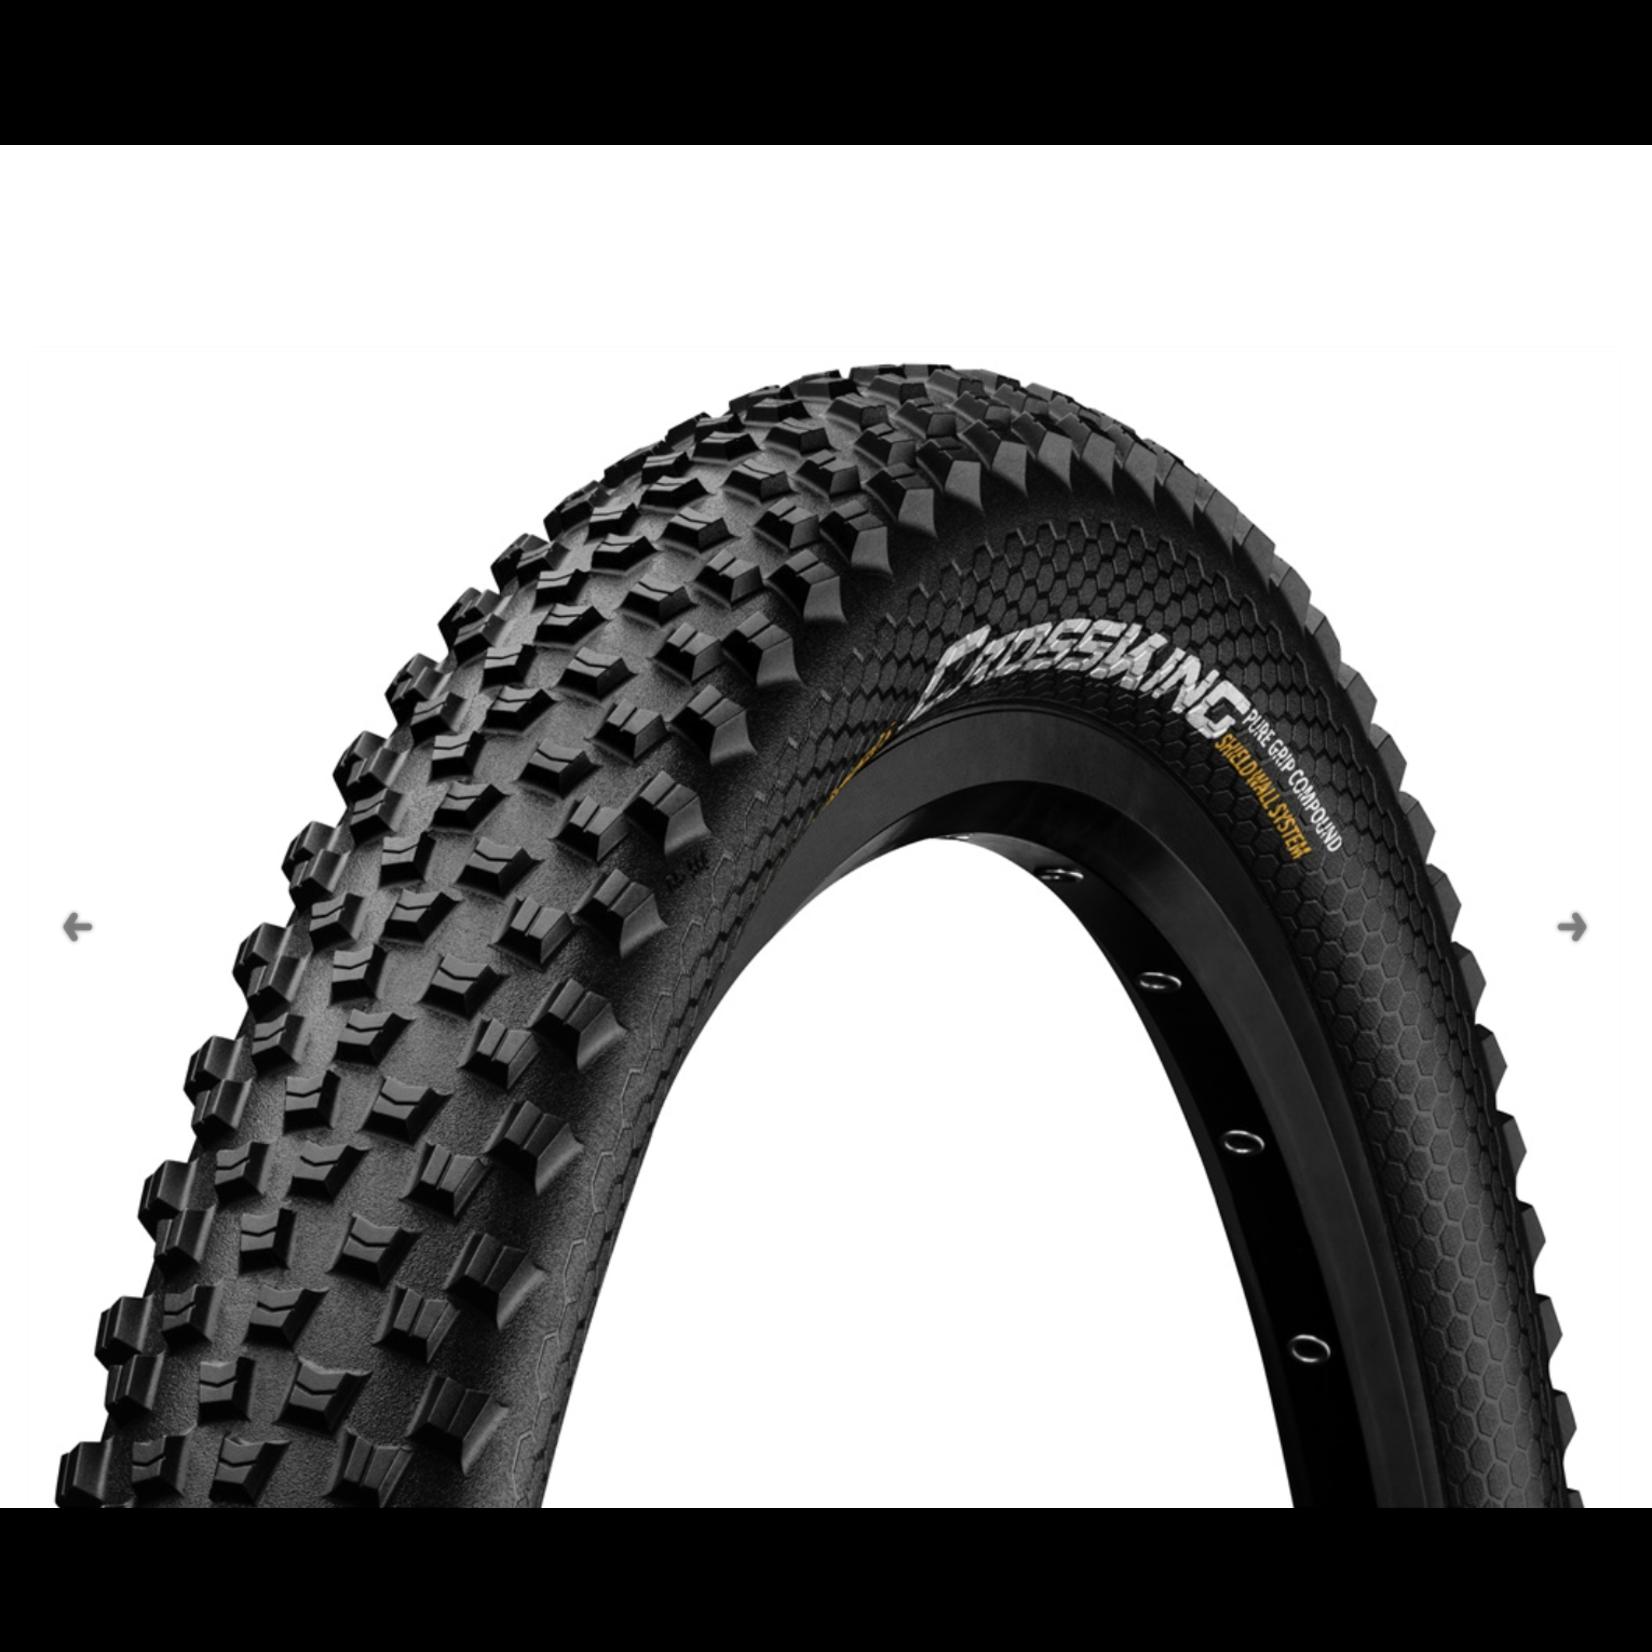 CONTINENTAL TIRES Continental XC/Enduro Tires Cross King 27.5 x 2.6 ShieldWall Folding TR + Puregrip